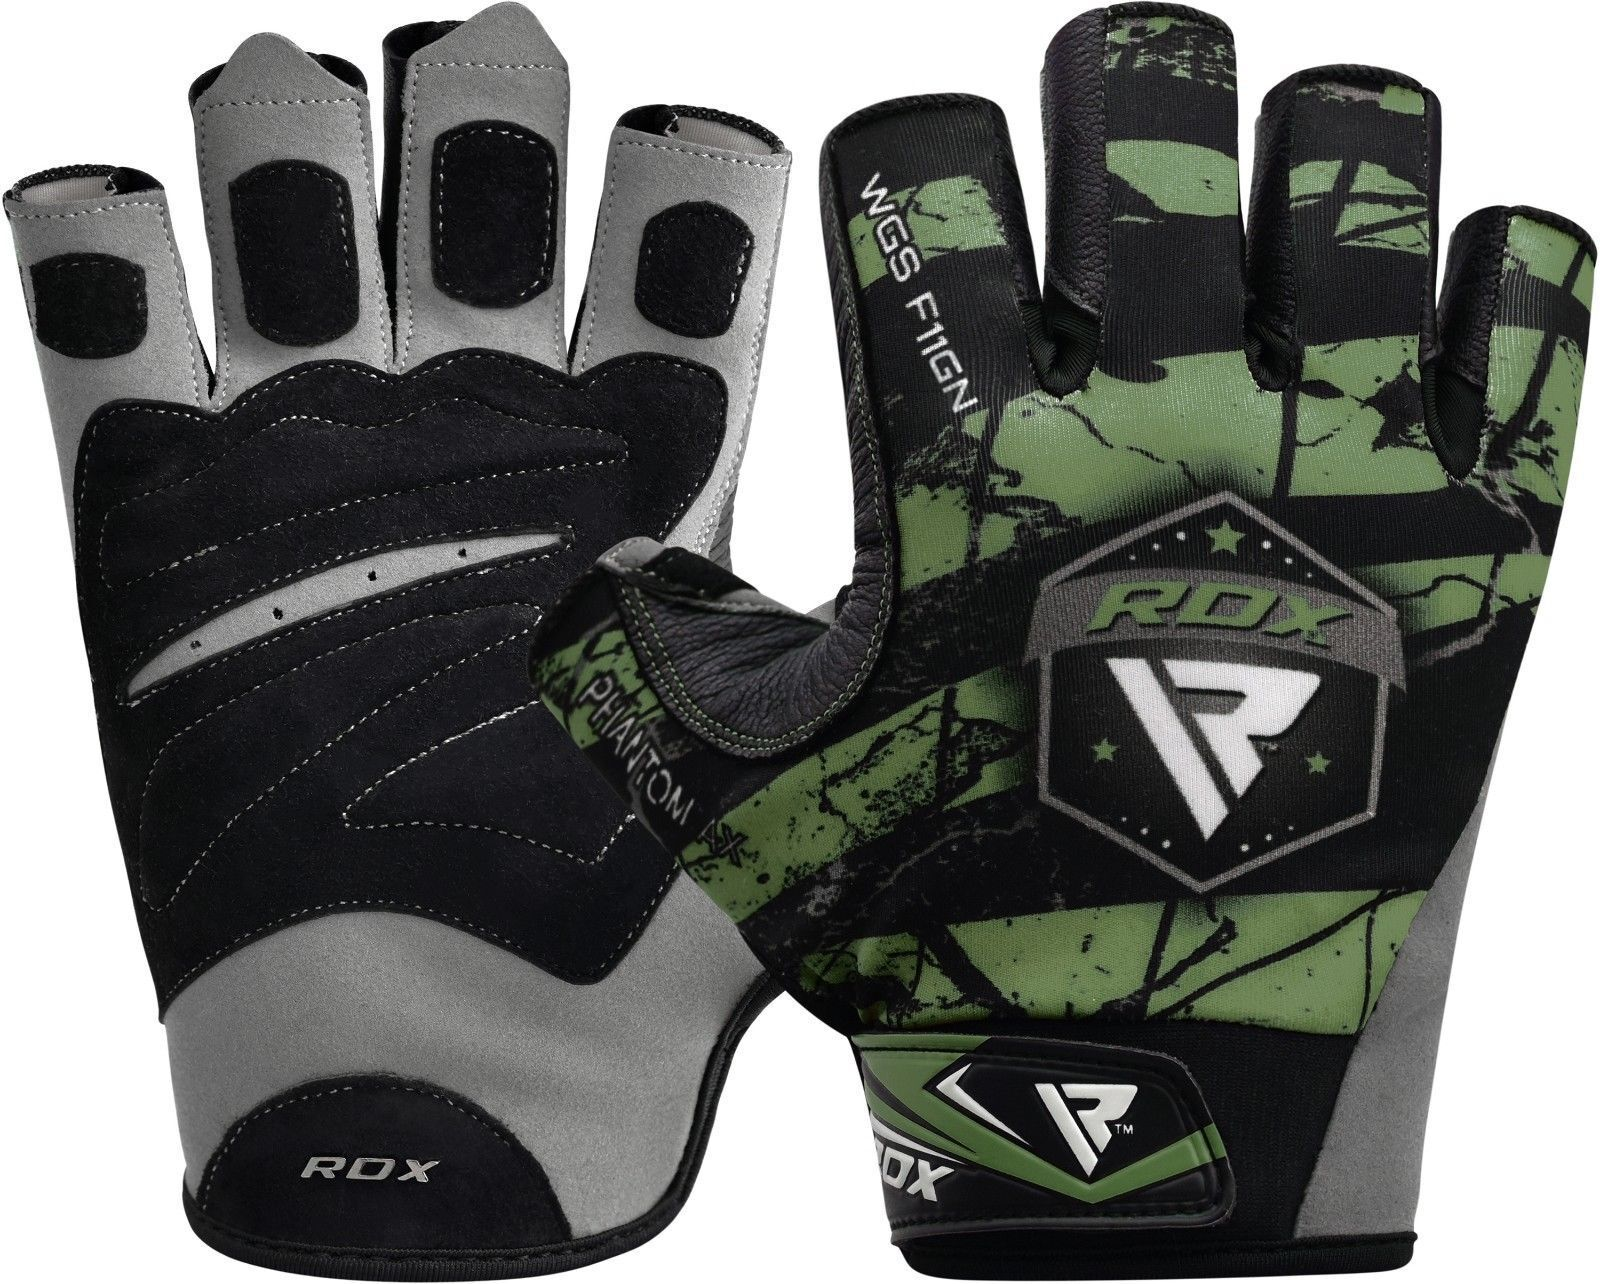 RDX Weight Lifting Gloves Gym Training Bodybuilding Yoga Fit